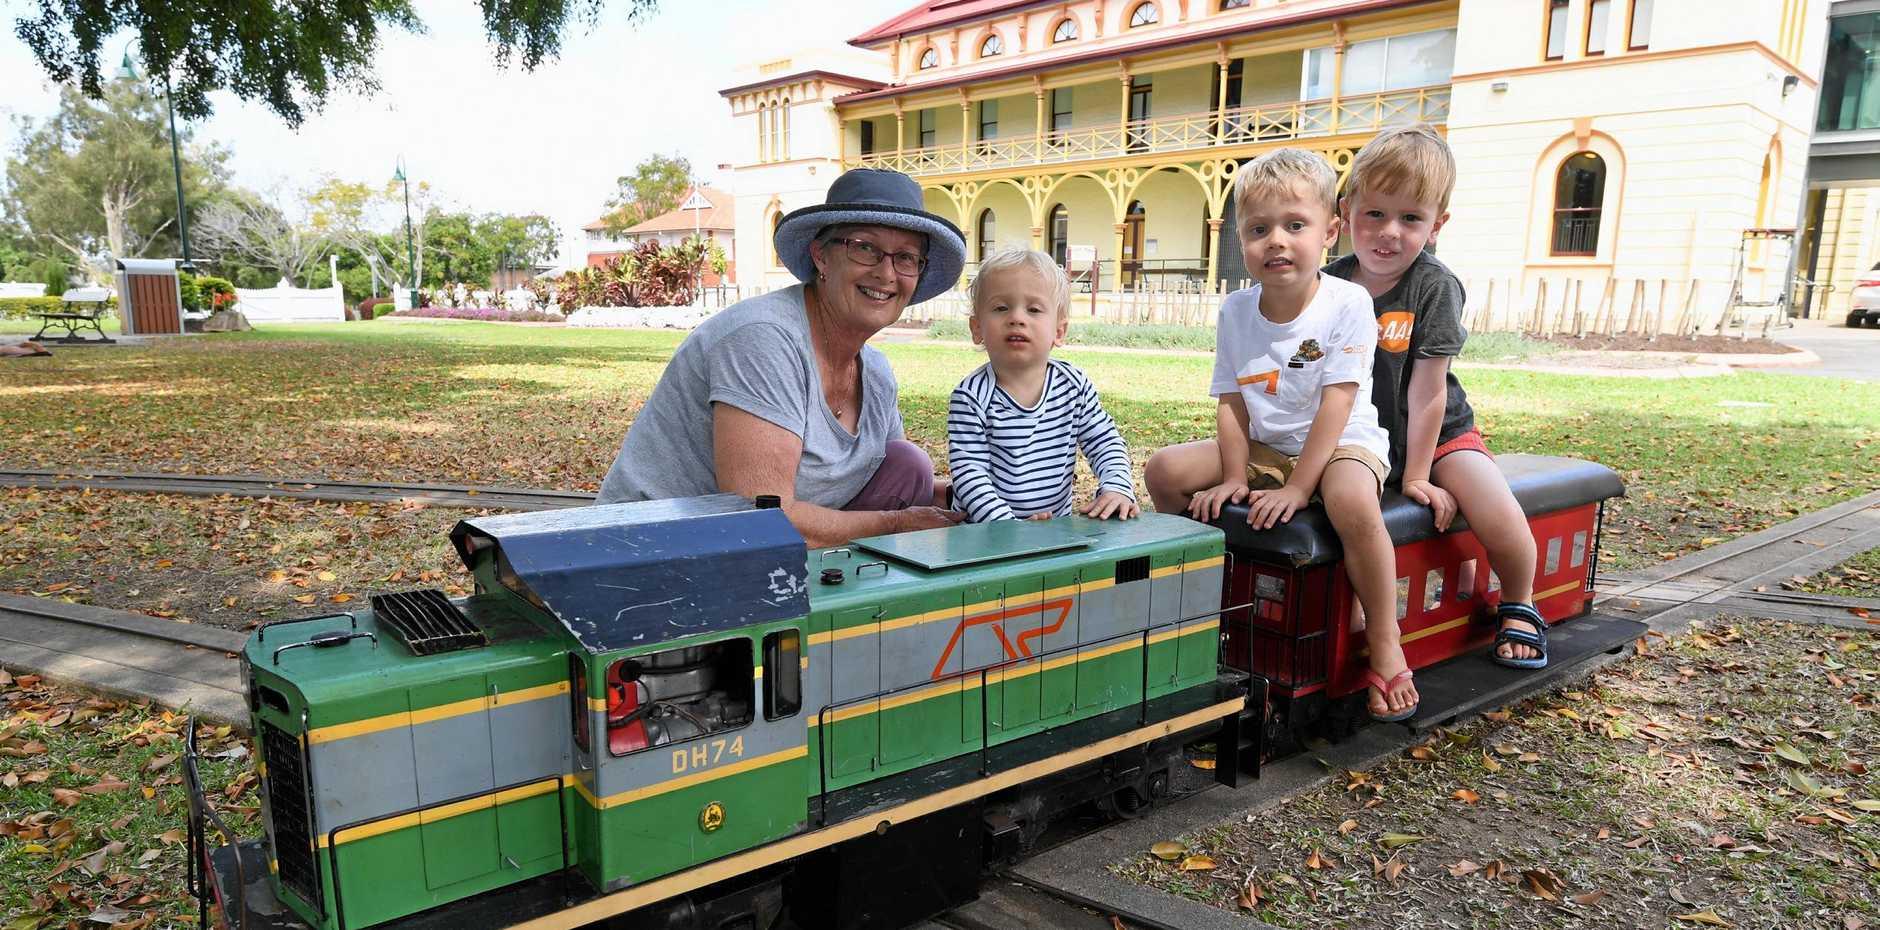 Melsa trains in Queen's Park - Melsa secretary Jill Harvey with grandchildren Charlie,14 mths, and Harry,4, Chilcott and their friend Noah Phersson,4.